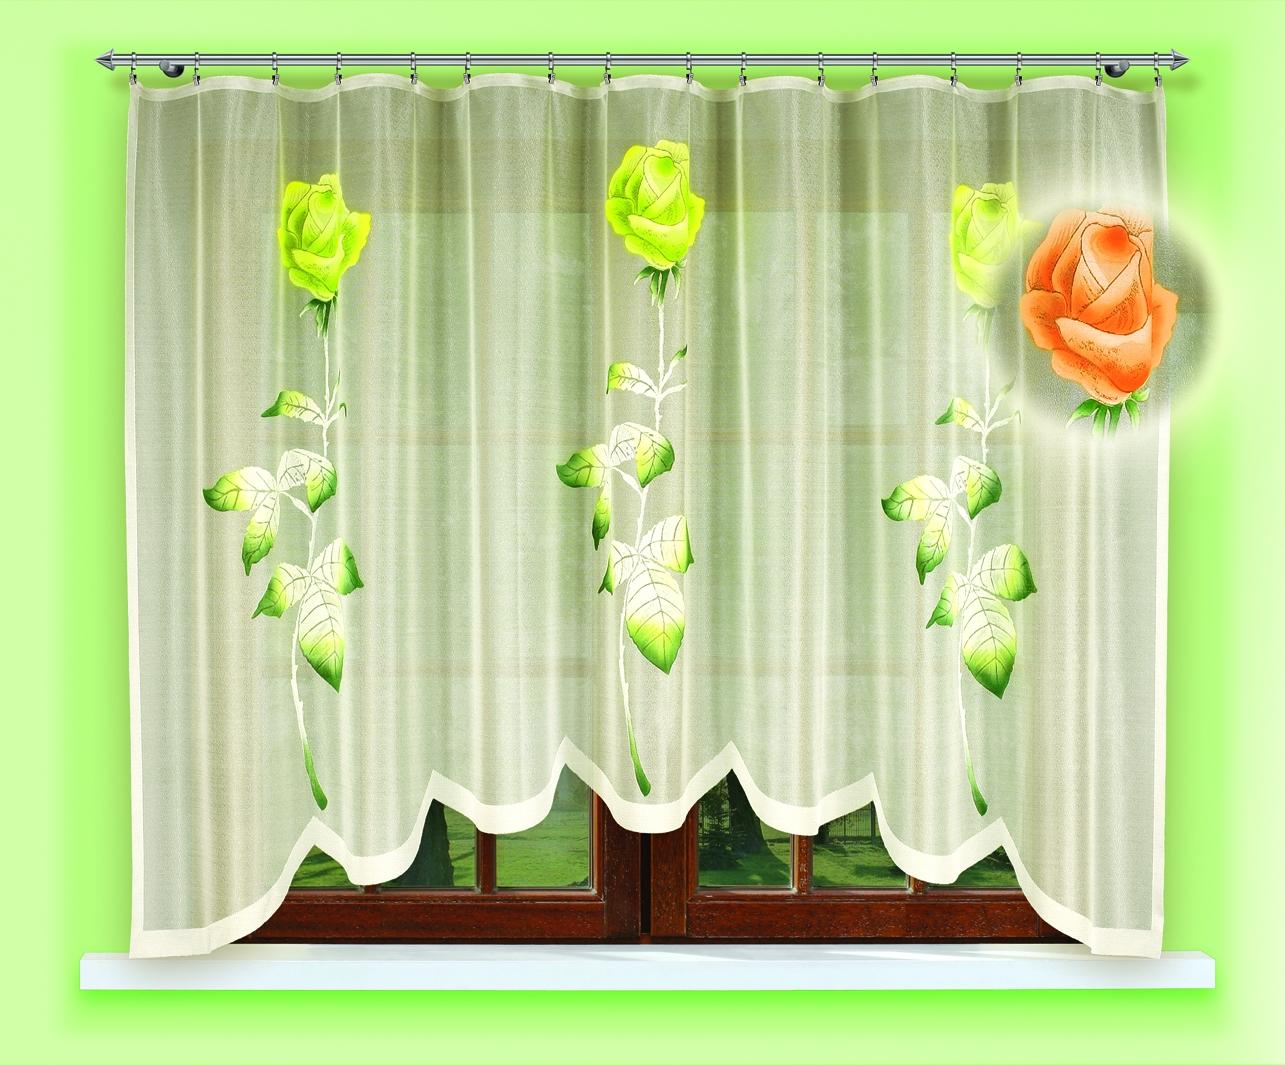 Гардина HAFT 160*300. 54550/160 зеленый54550/160 зеленыйГардина XAFT 160*300. 54550/160 зеленый Материал: 100% п/э, размер: 160*300, цвет: зеленый